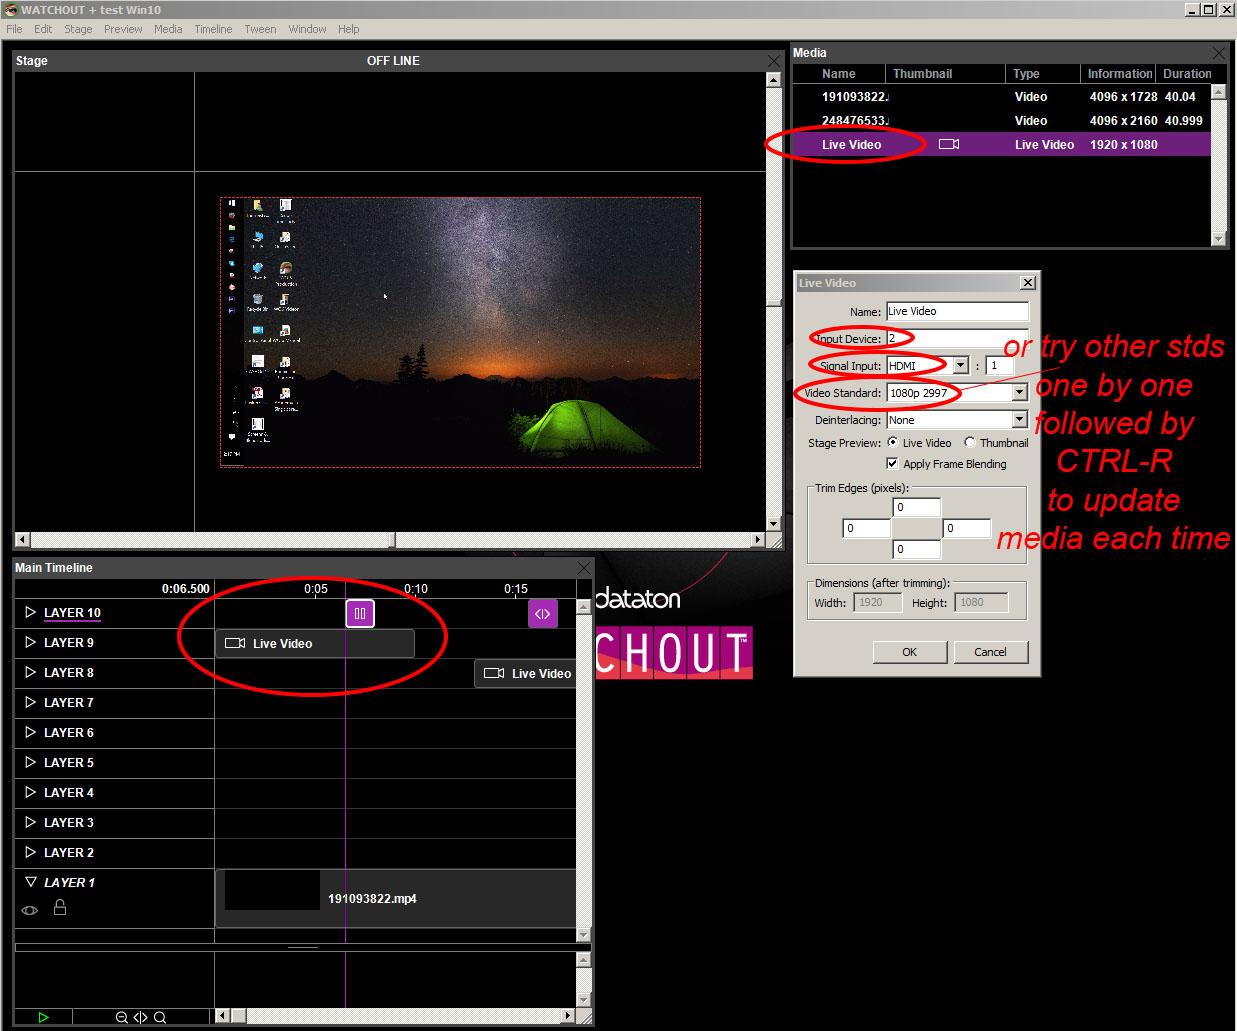 4-Watchout_Live_Video_Media_Capture%20se